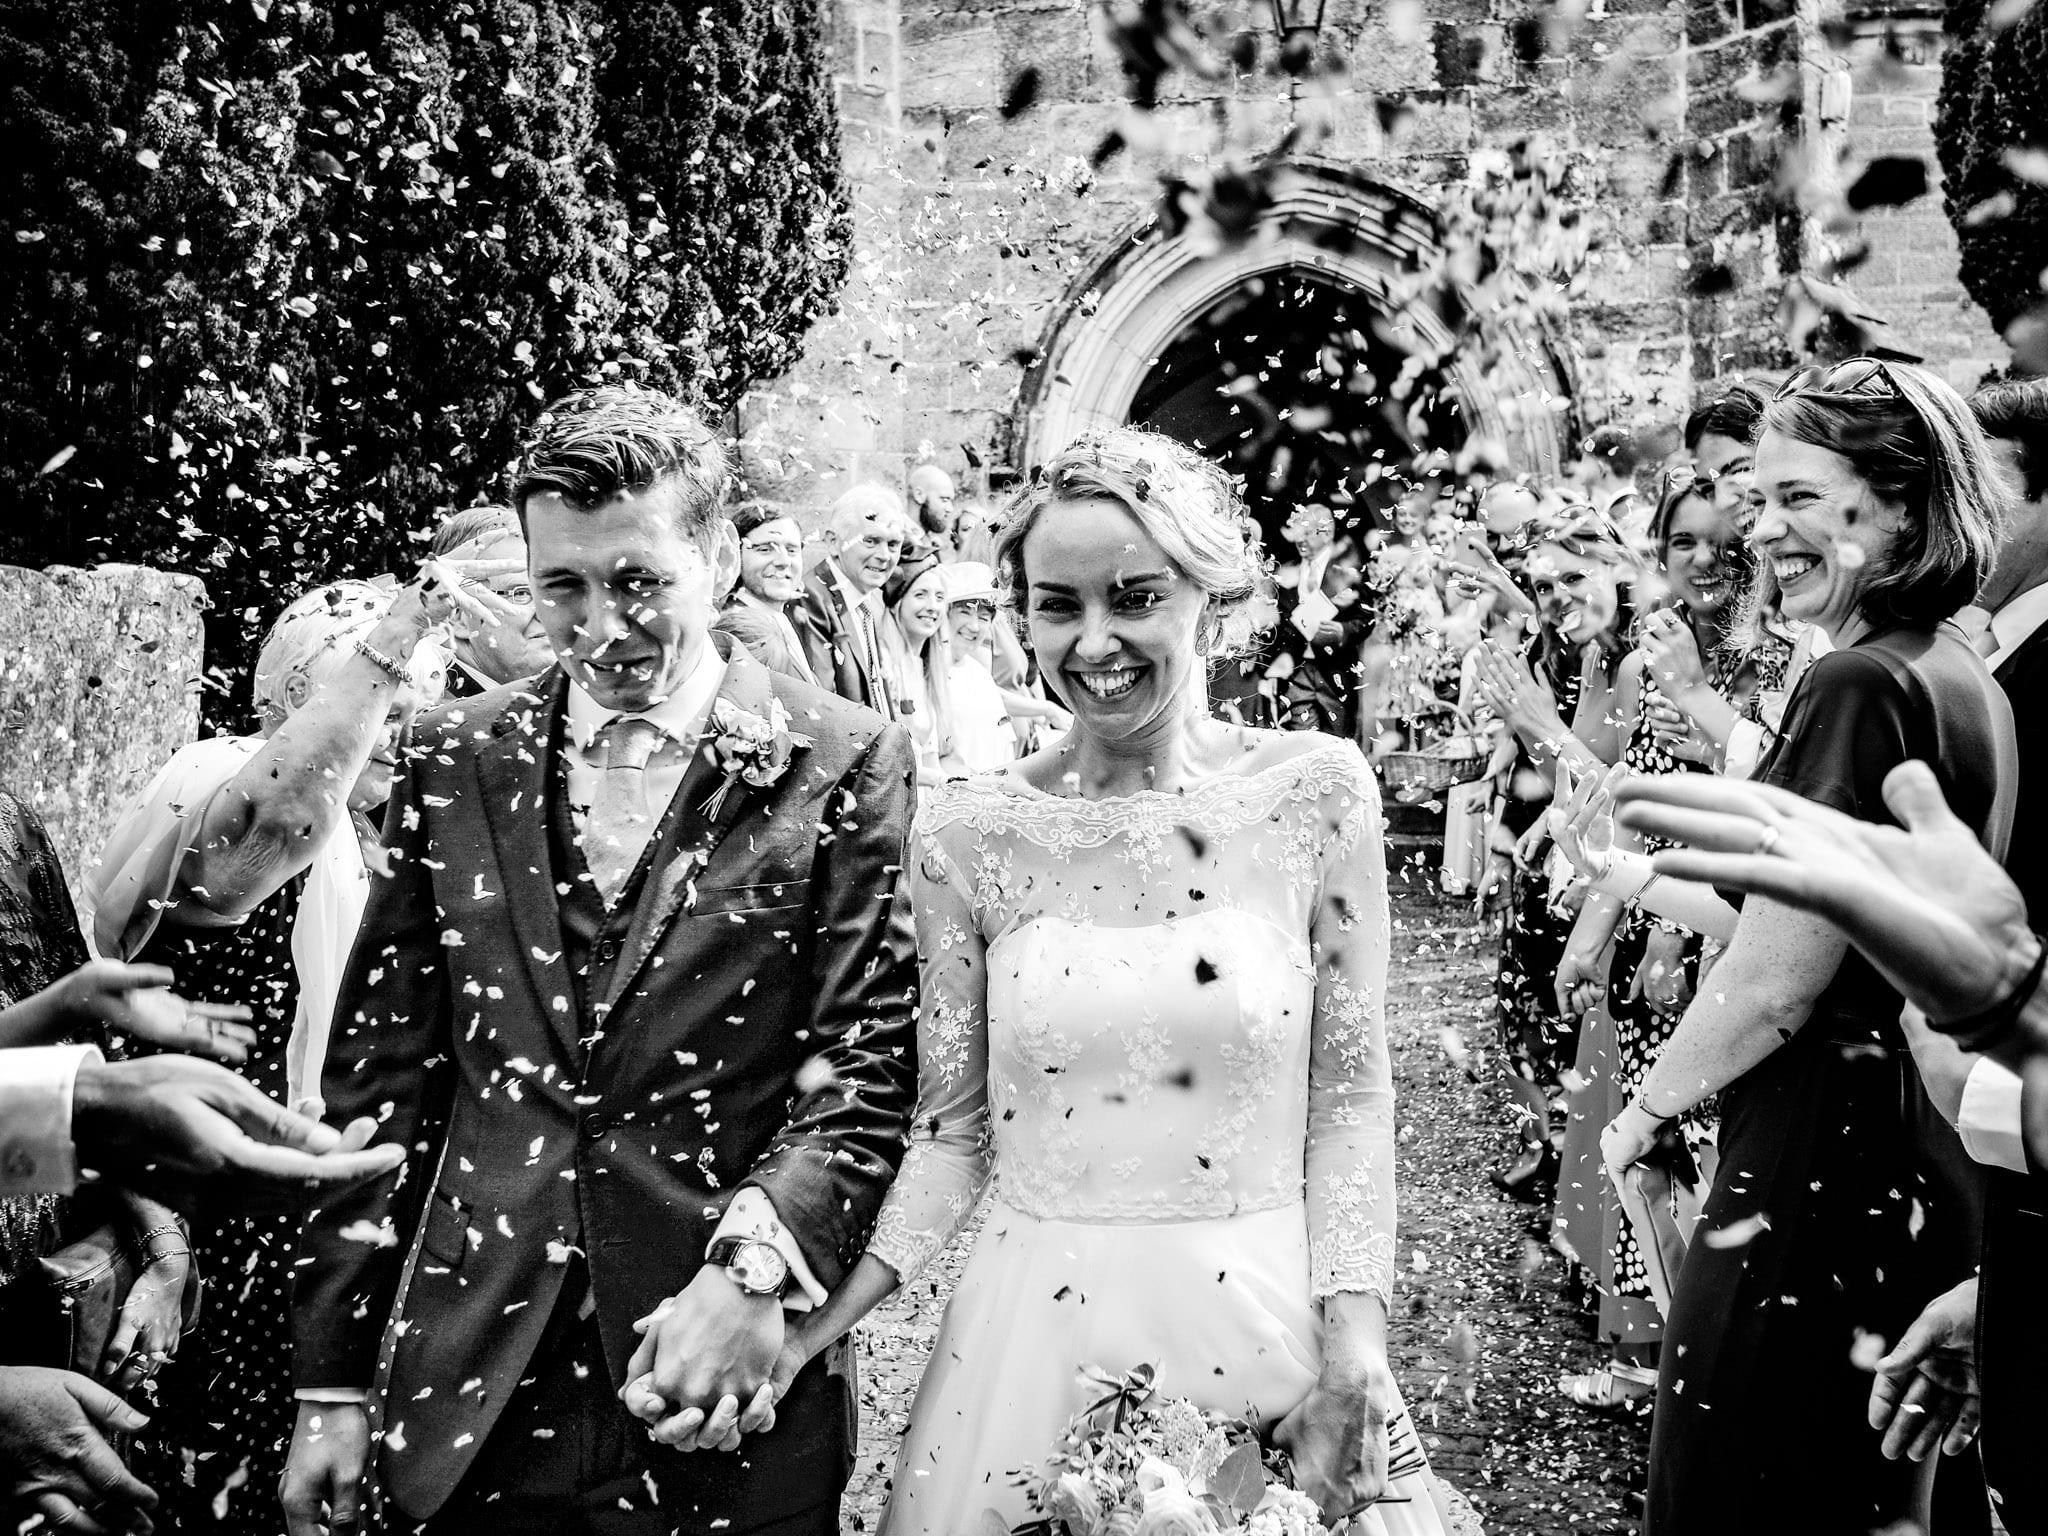 Bride and groom in confetti in black and white